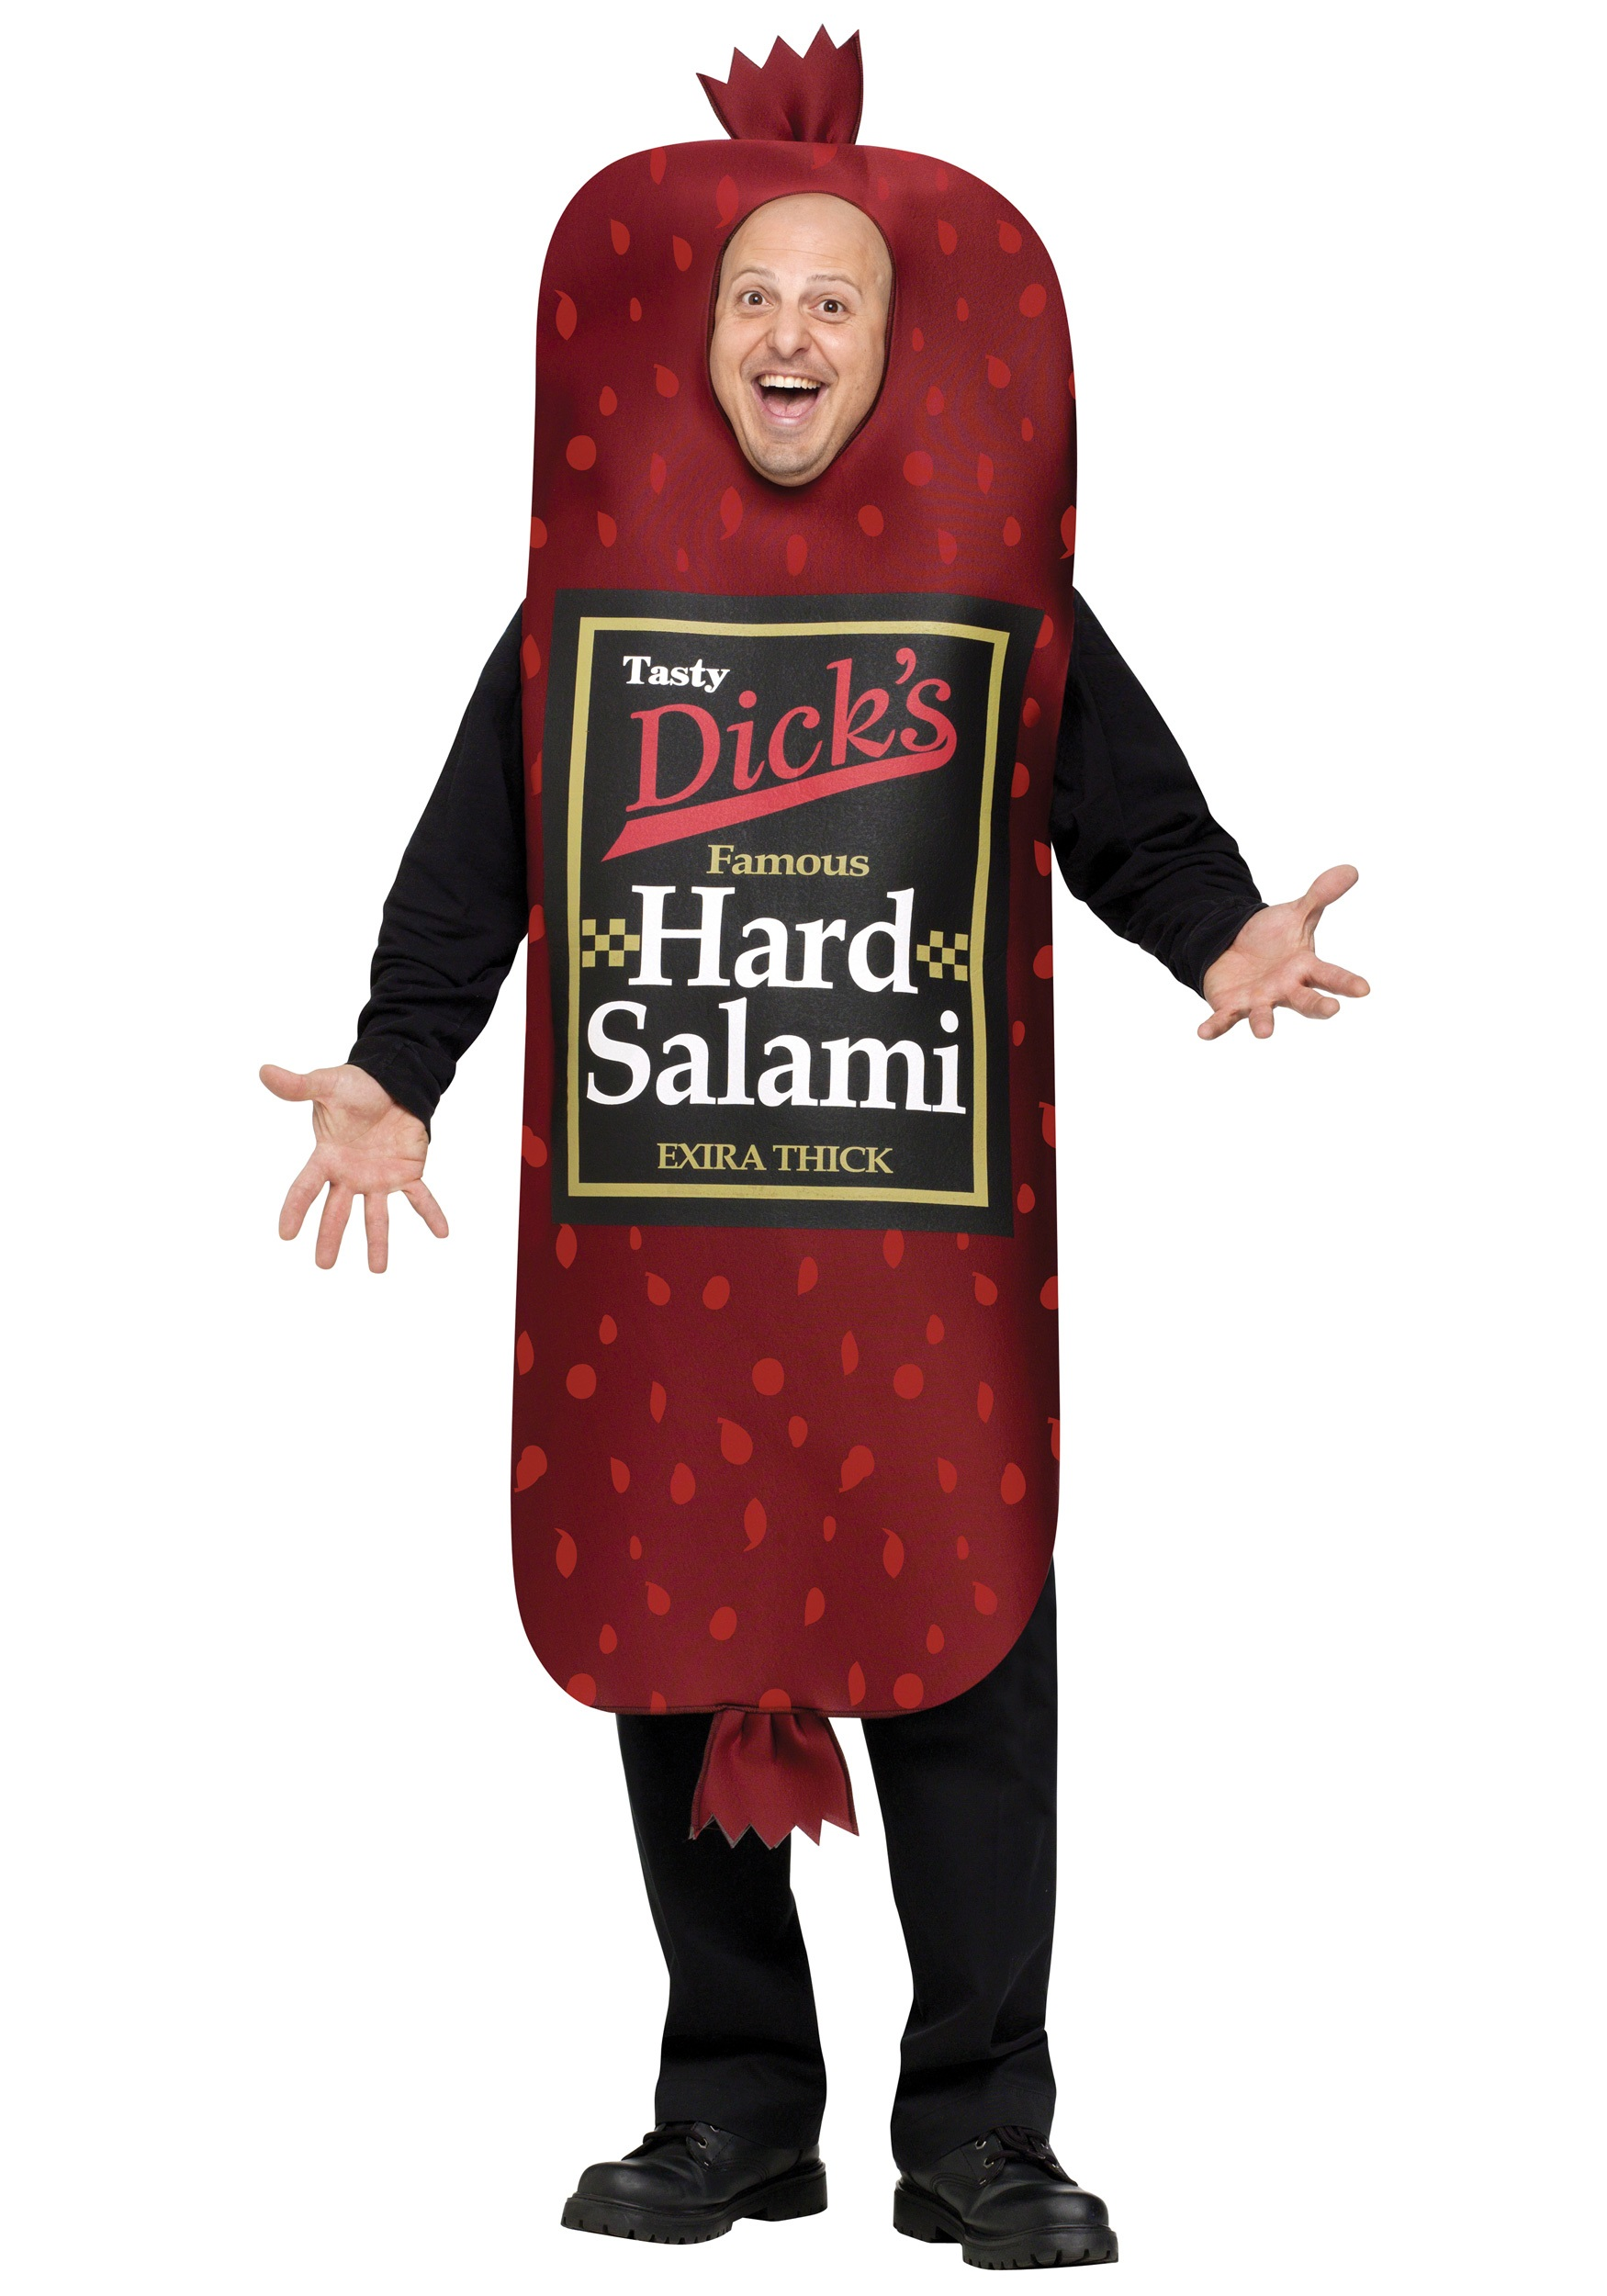 mens-hard-salami-stick-costume[1].jpg  sc 1 st  Polaris Slingshot Forum & Halloween Costume Ideas (not Batman) | Page 2 | Polaris Slingshot Forum